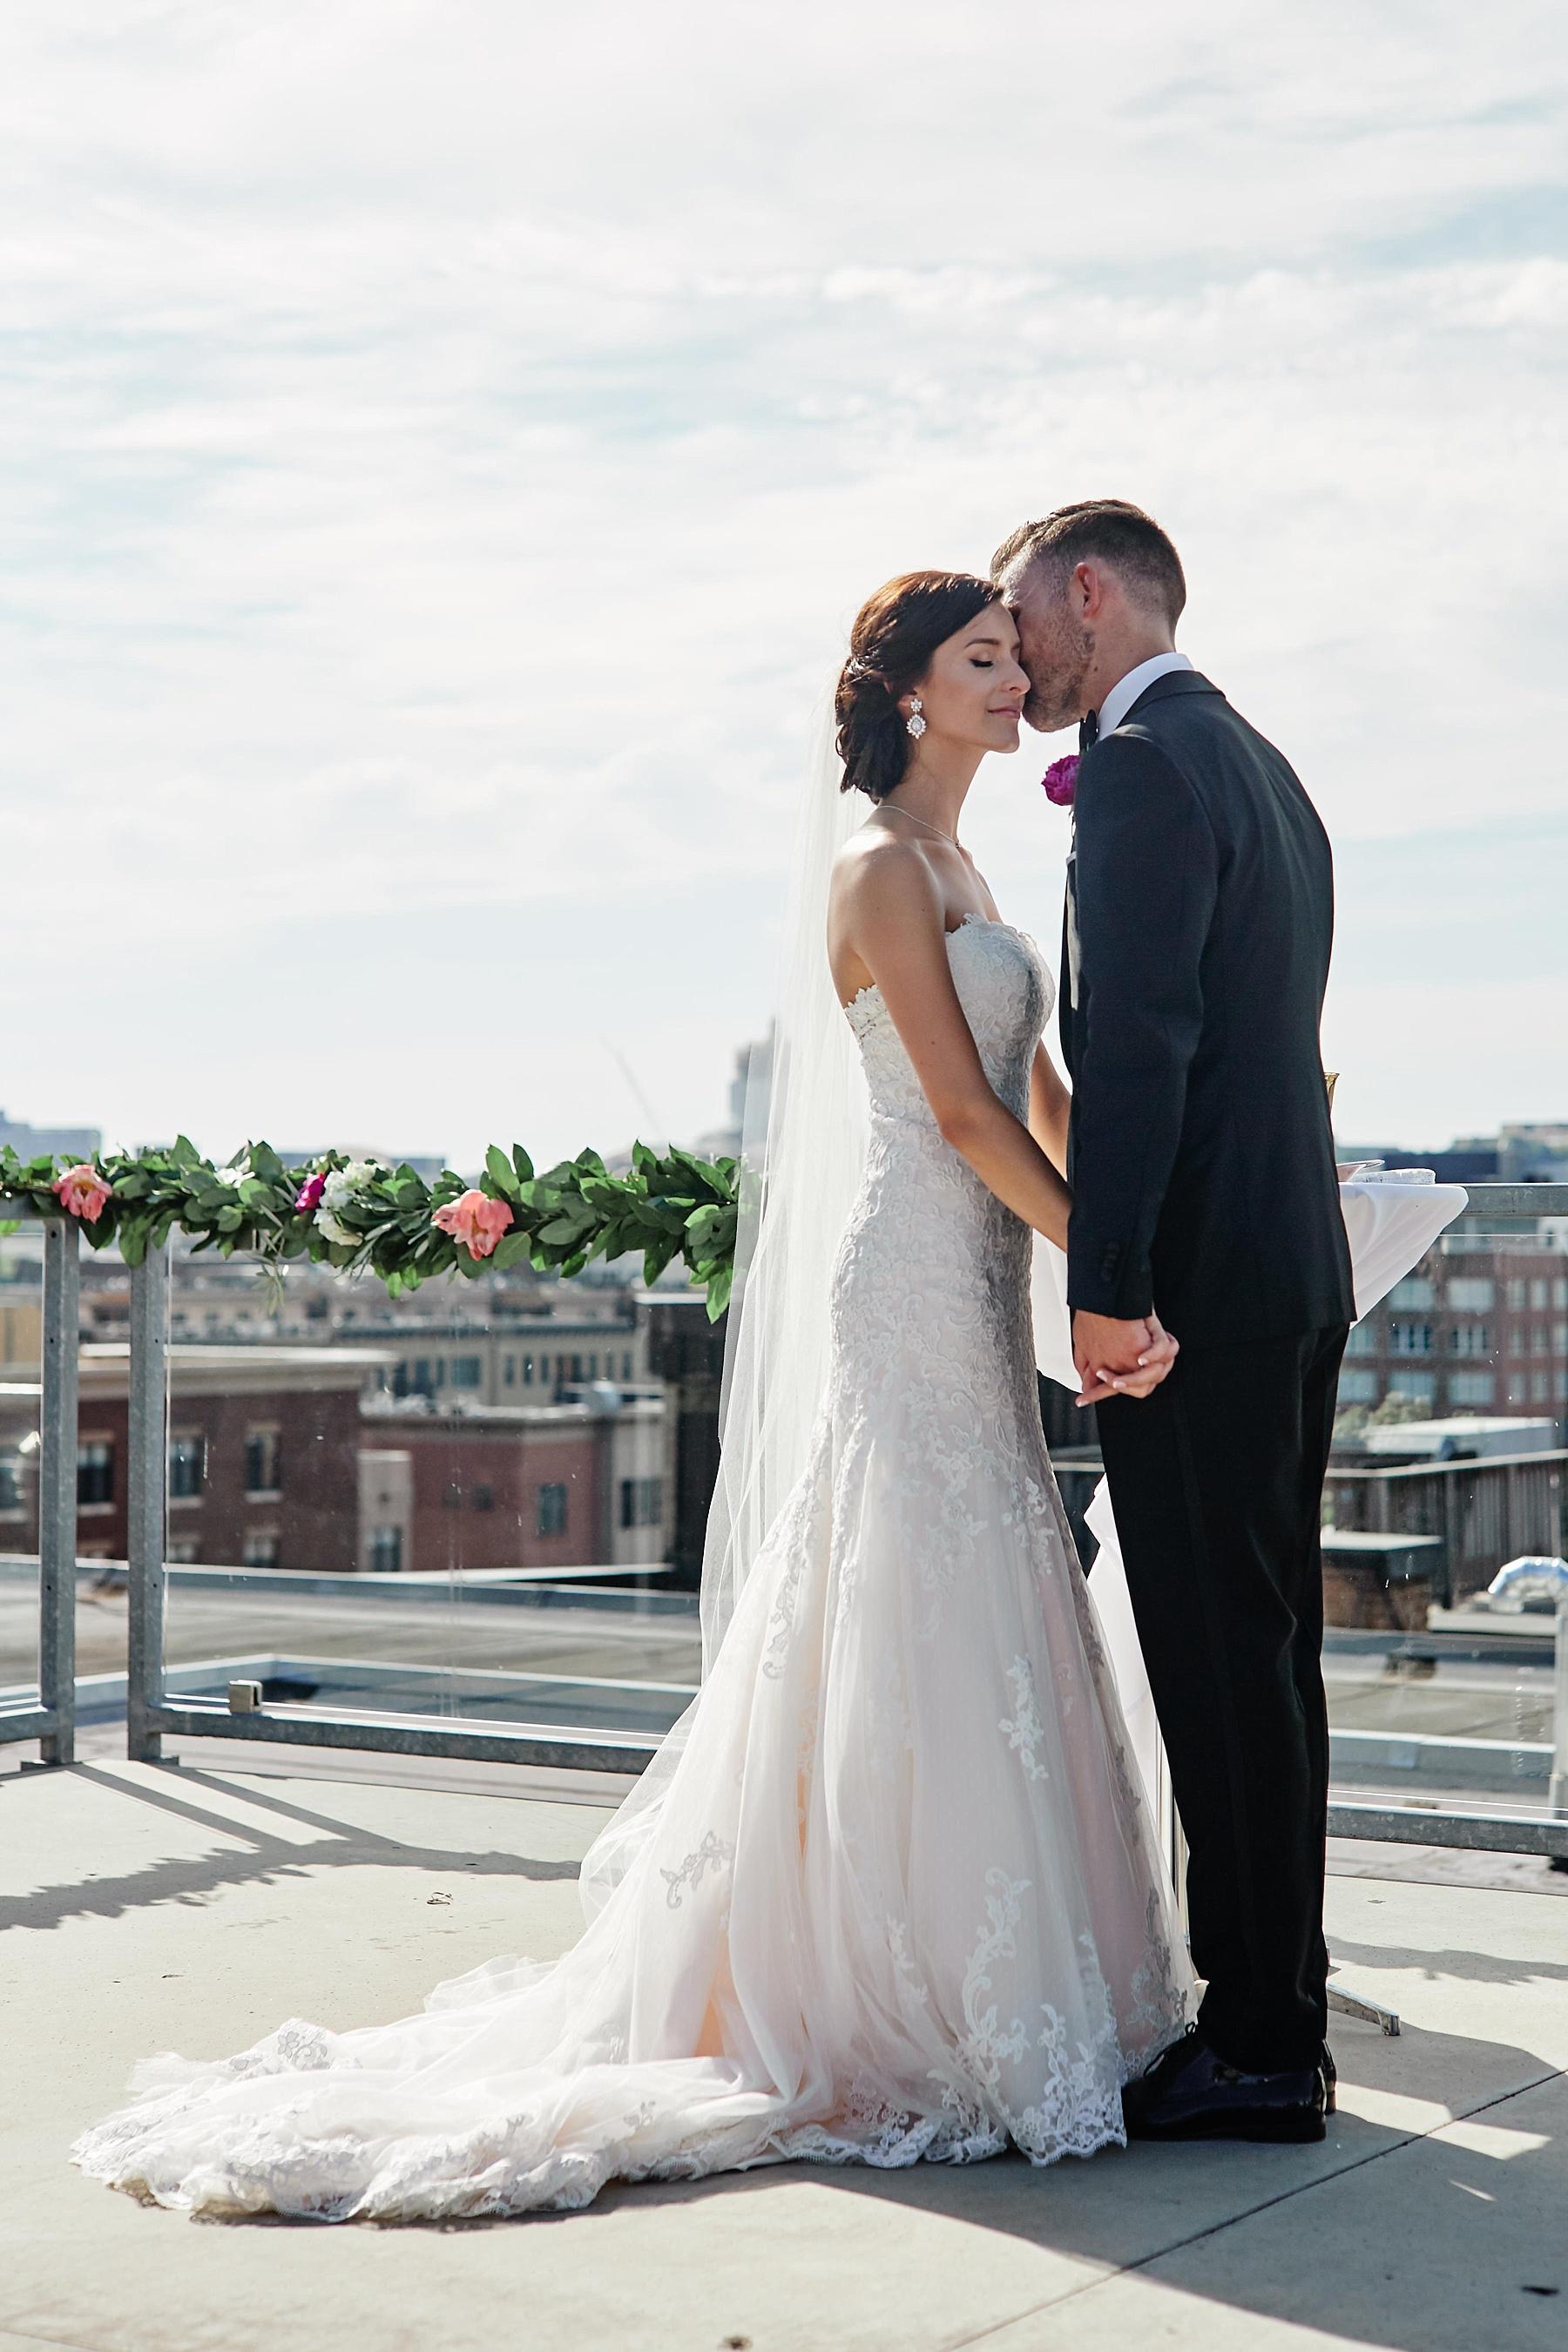 ABULAE-Wedding-Saint-paul-MN-Josh-Sofia-Wedding-Mears-Park_0770.jpg